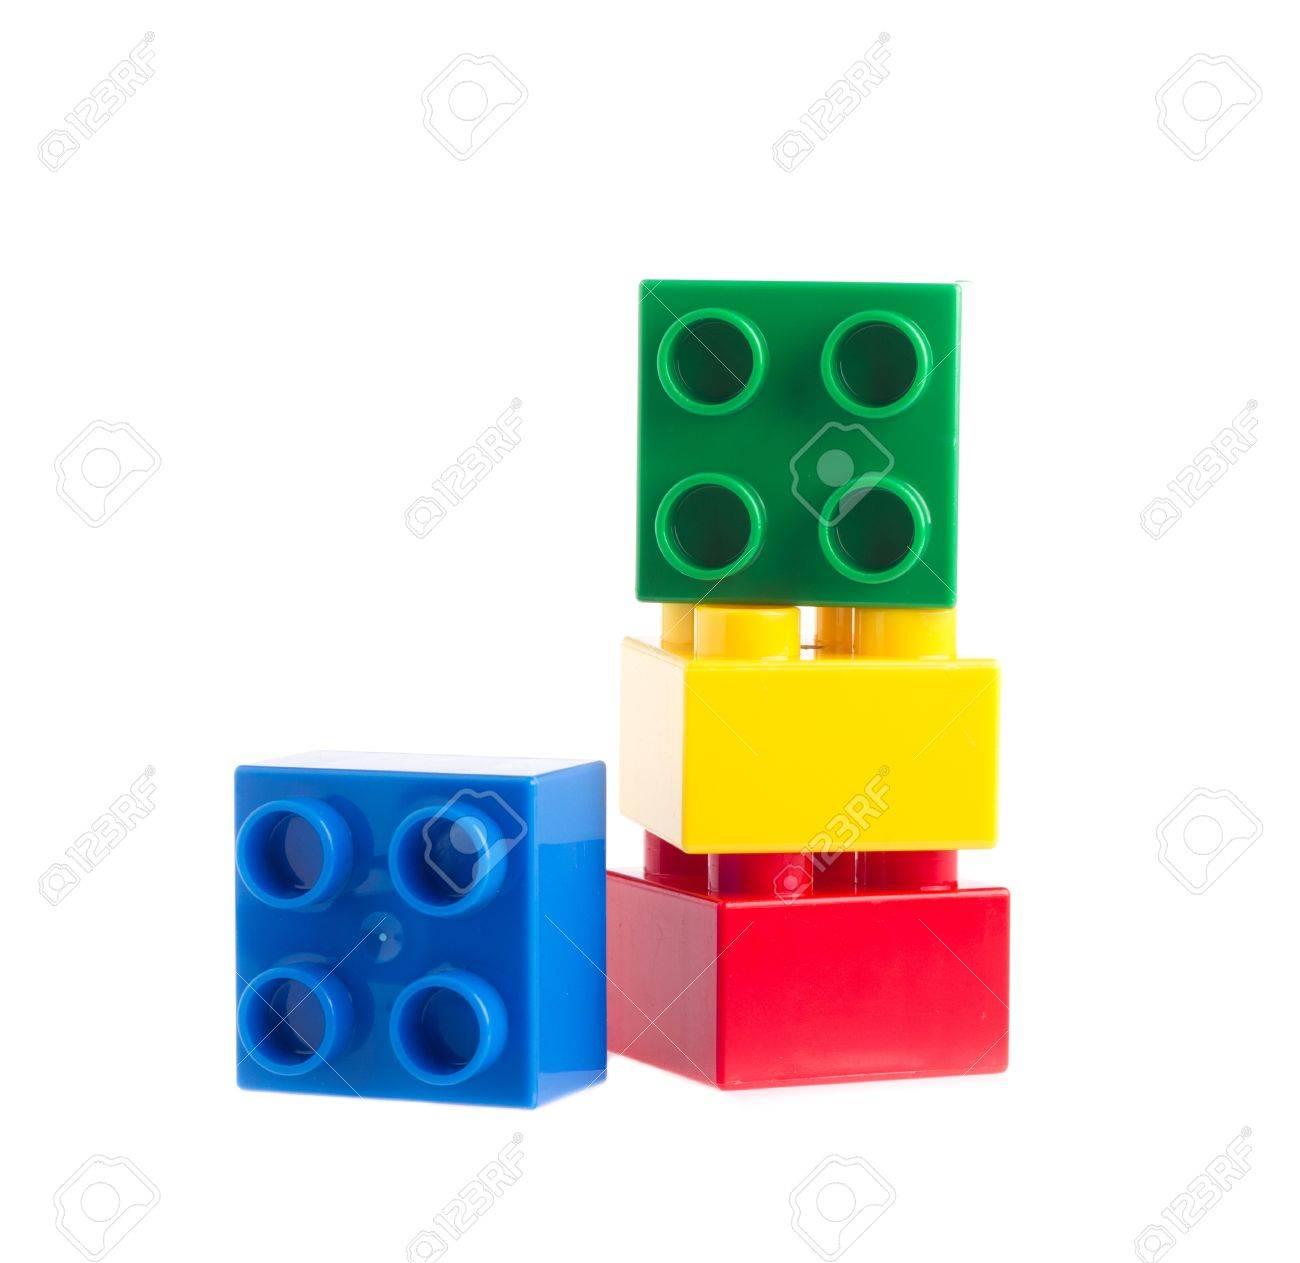 Plastic building blocks isolated on white background - 13504773